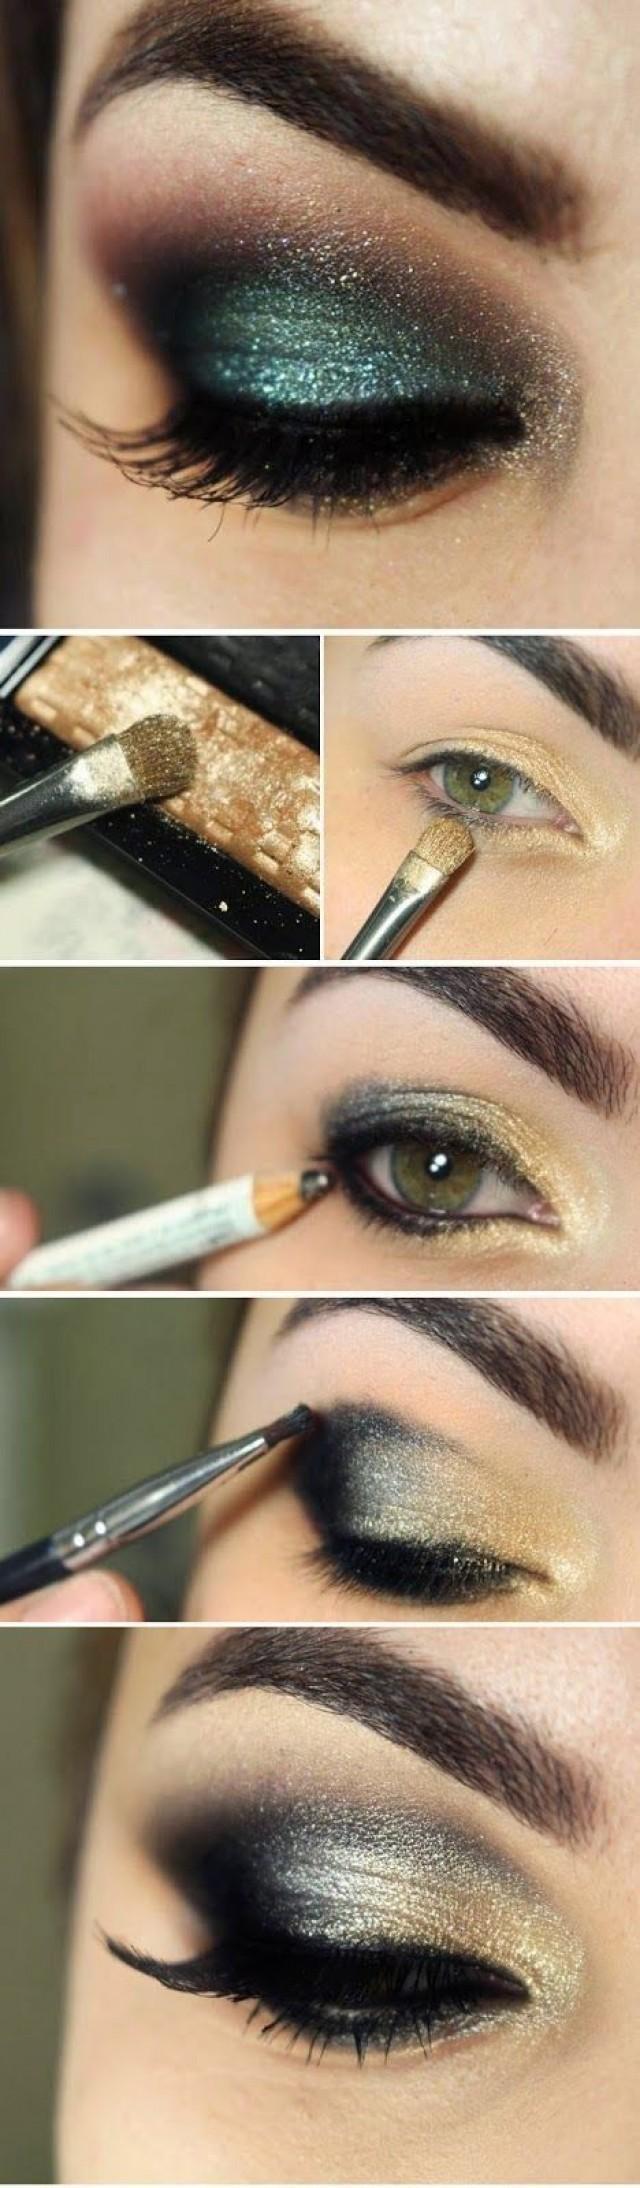 Easy smokey eye makeup tutorial